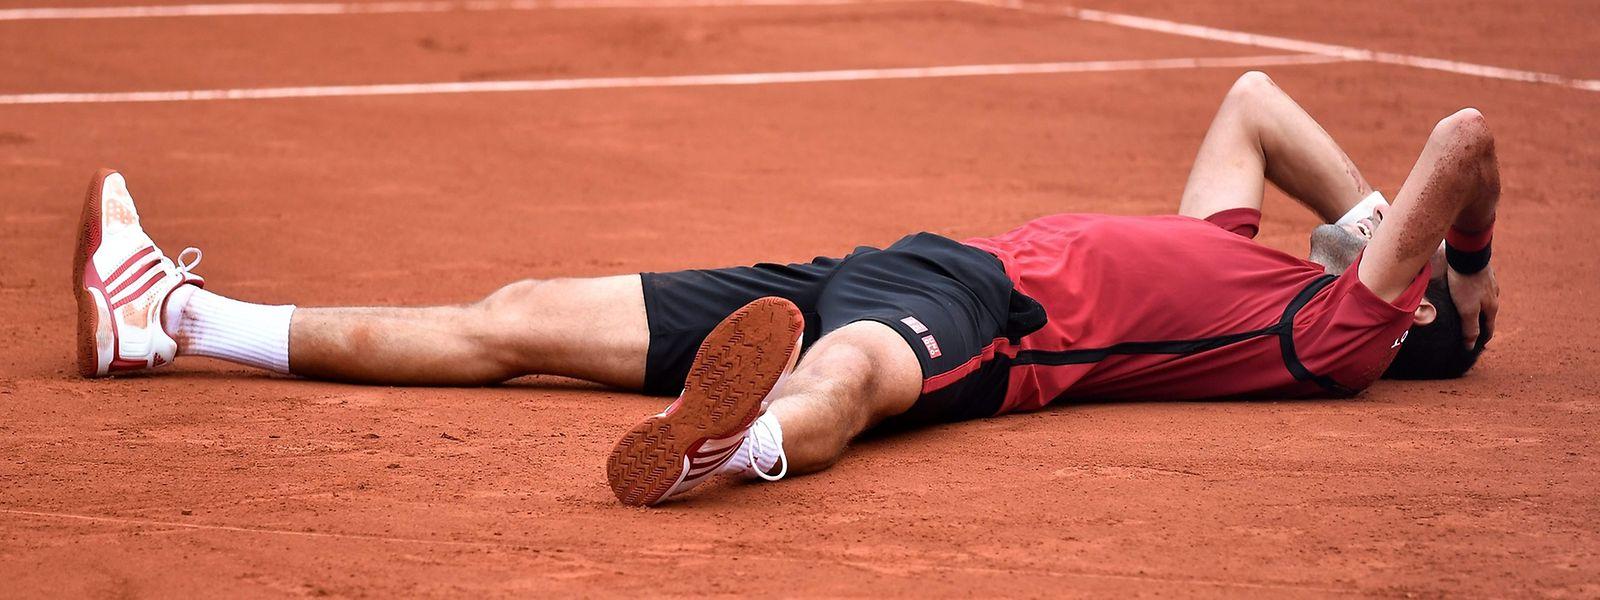 Novak Djokovic konnte sein Glück kaum fassen.